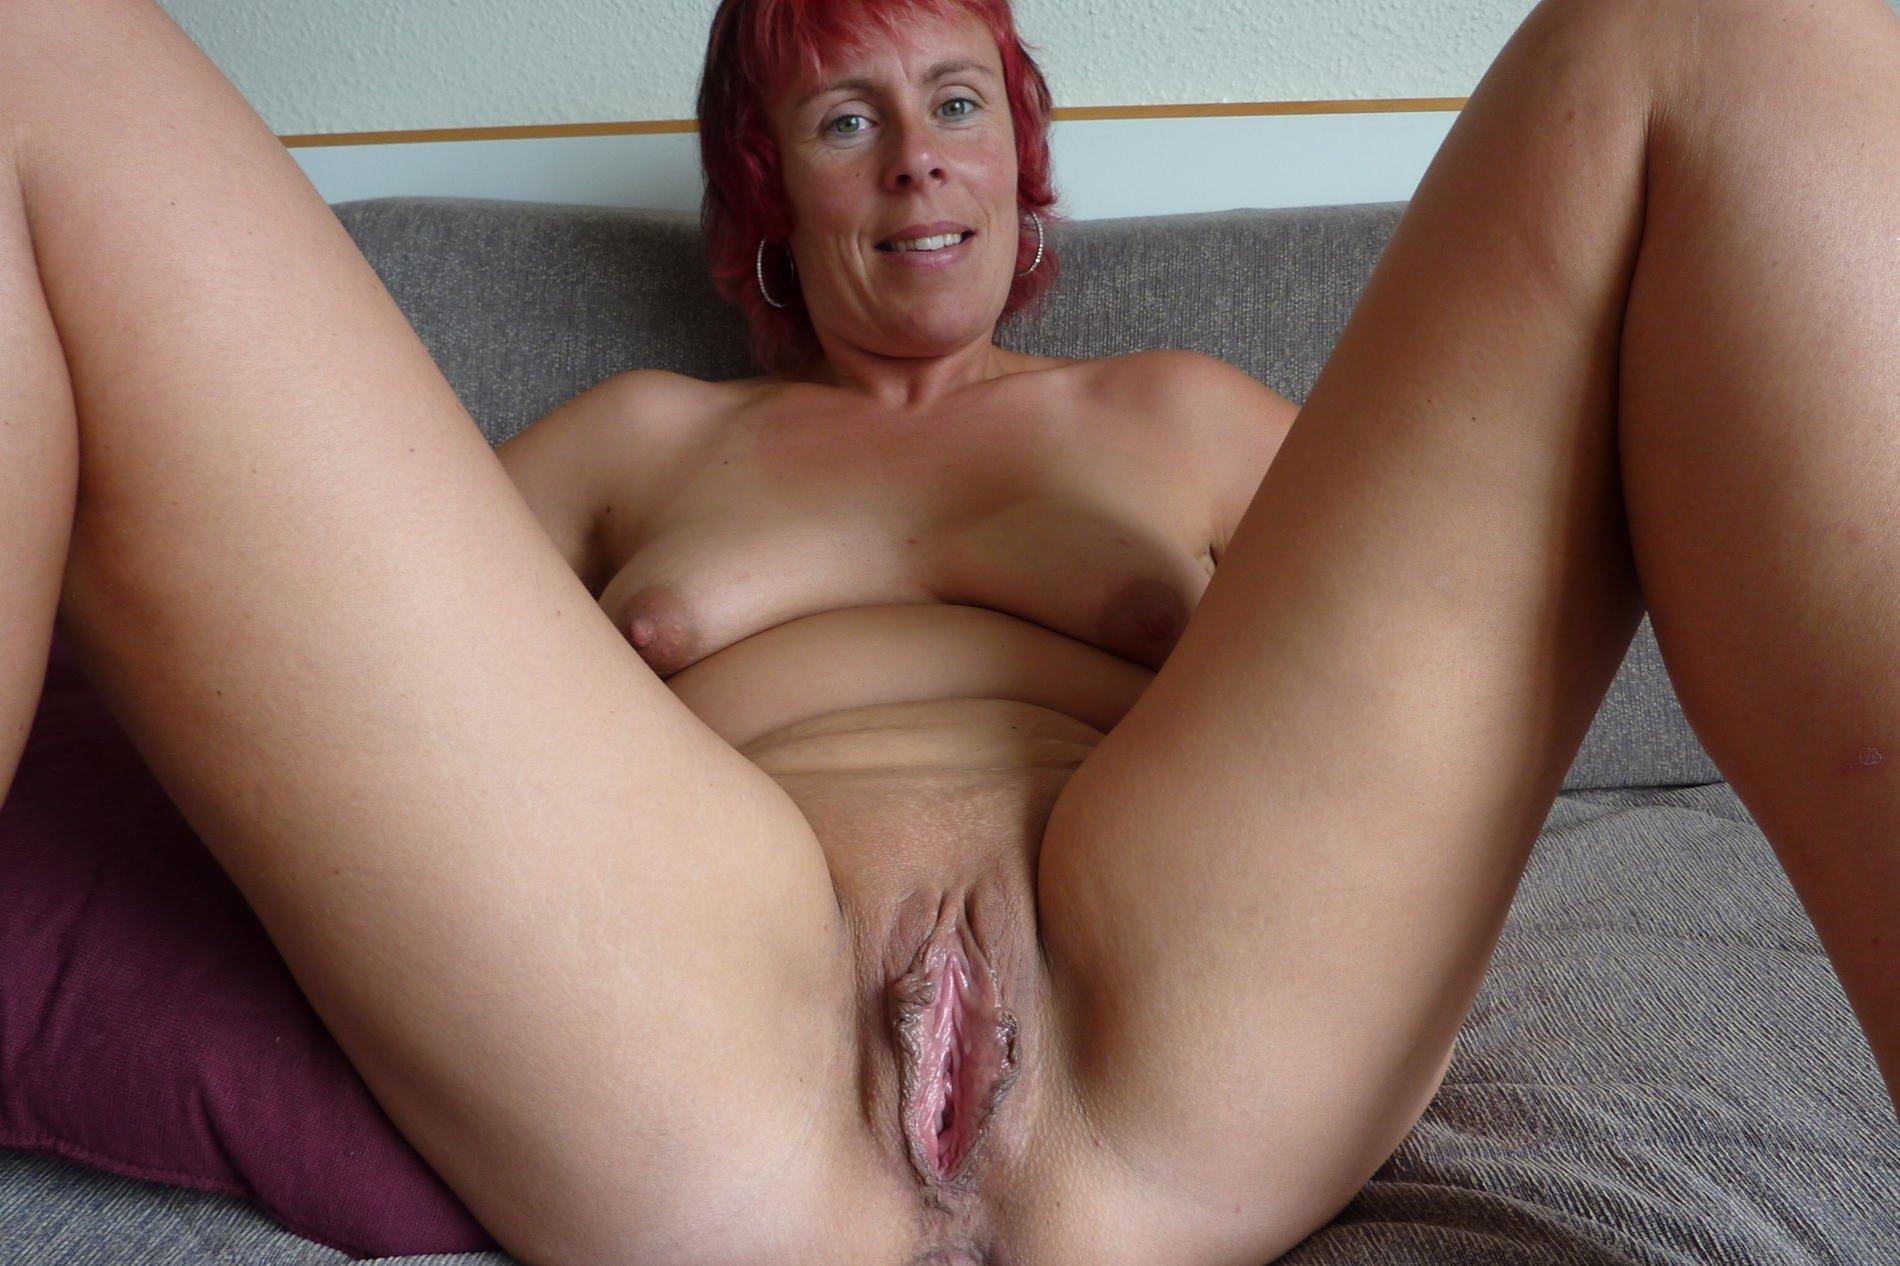 Mature Saggy Old Milf Gets Naked